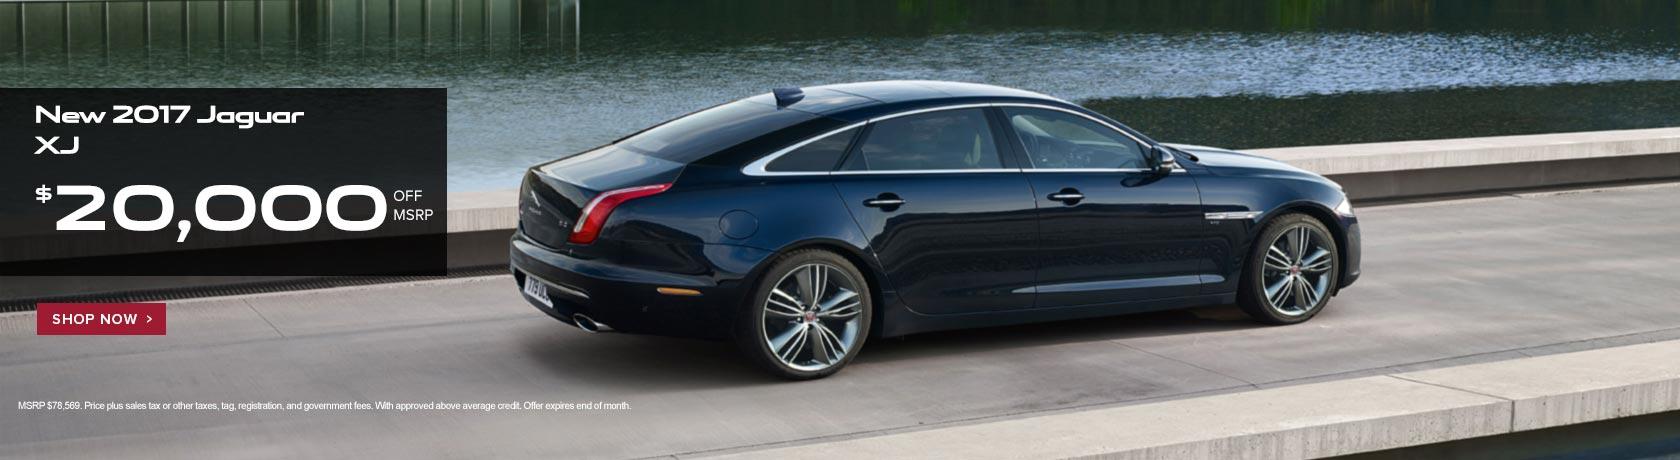 benz used maserati cars major dealership and monica jaguar bmw santa dealer mercedes motor nearest